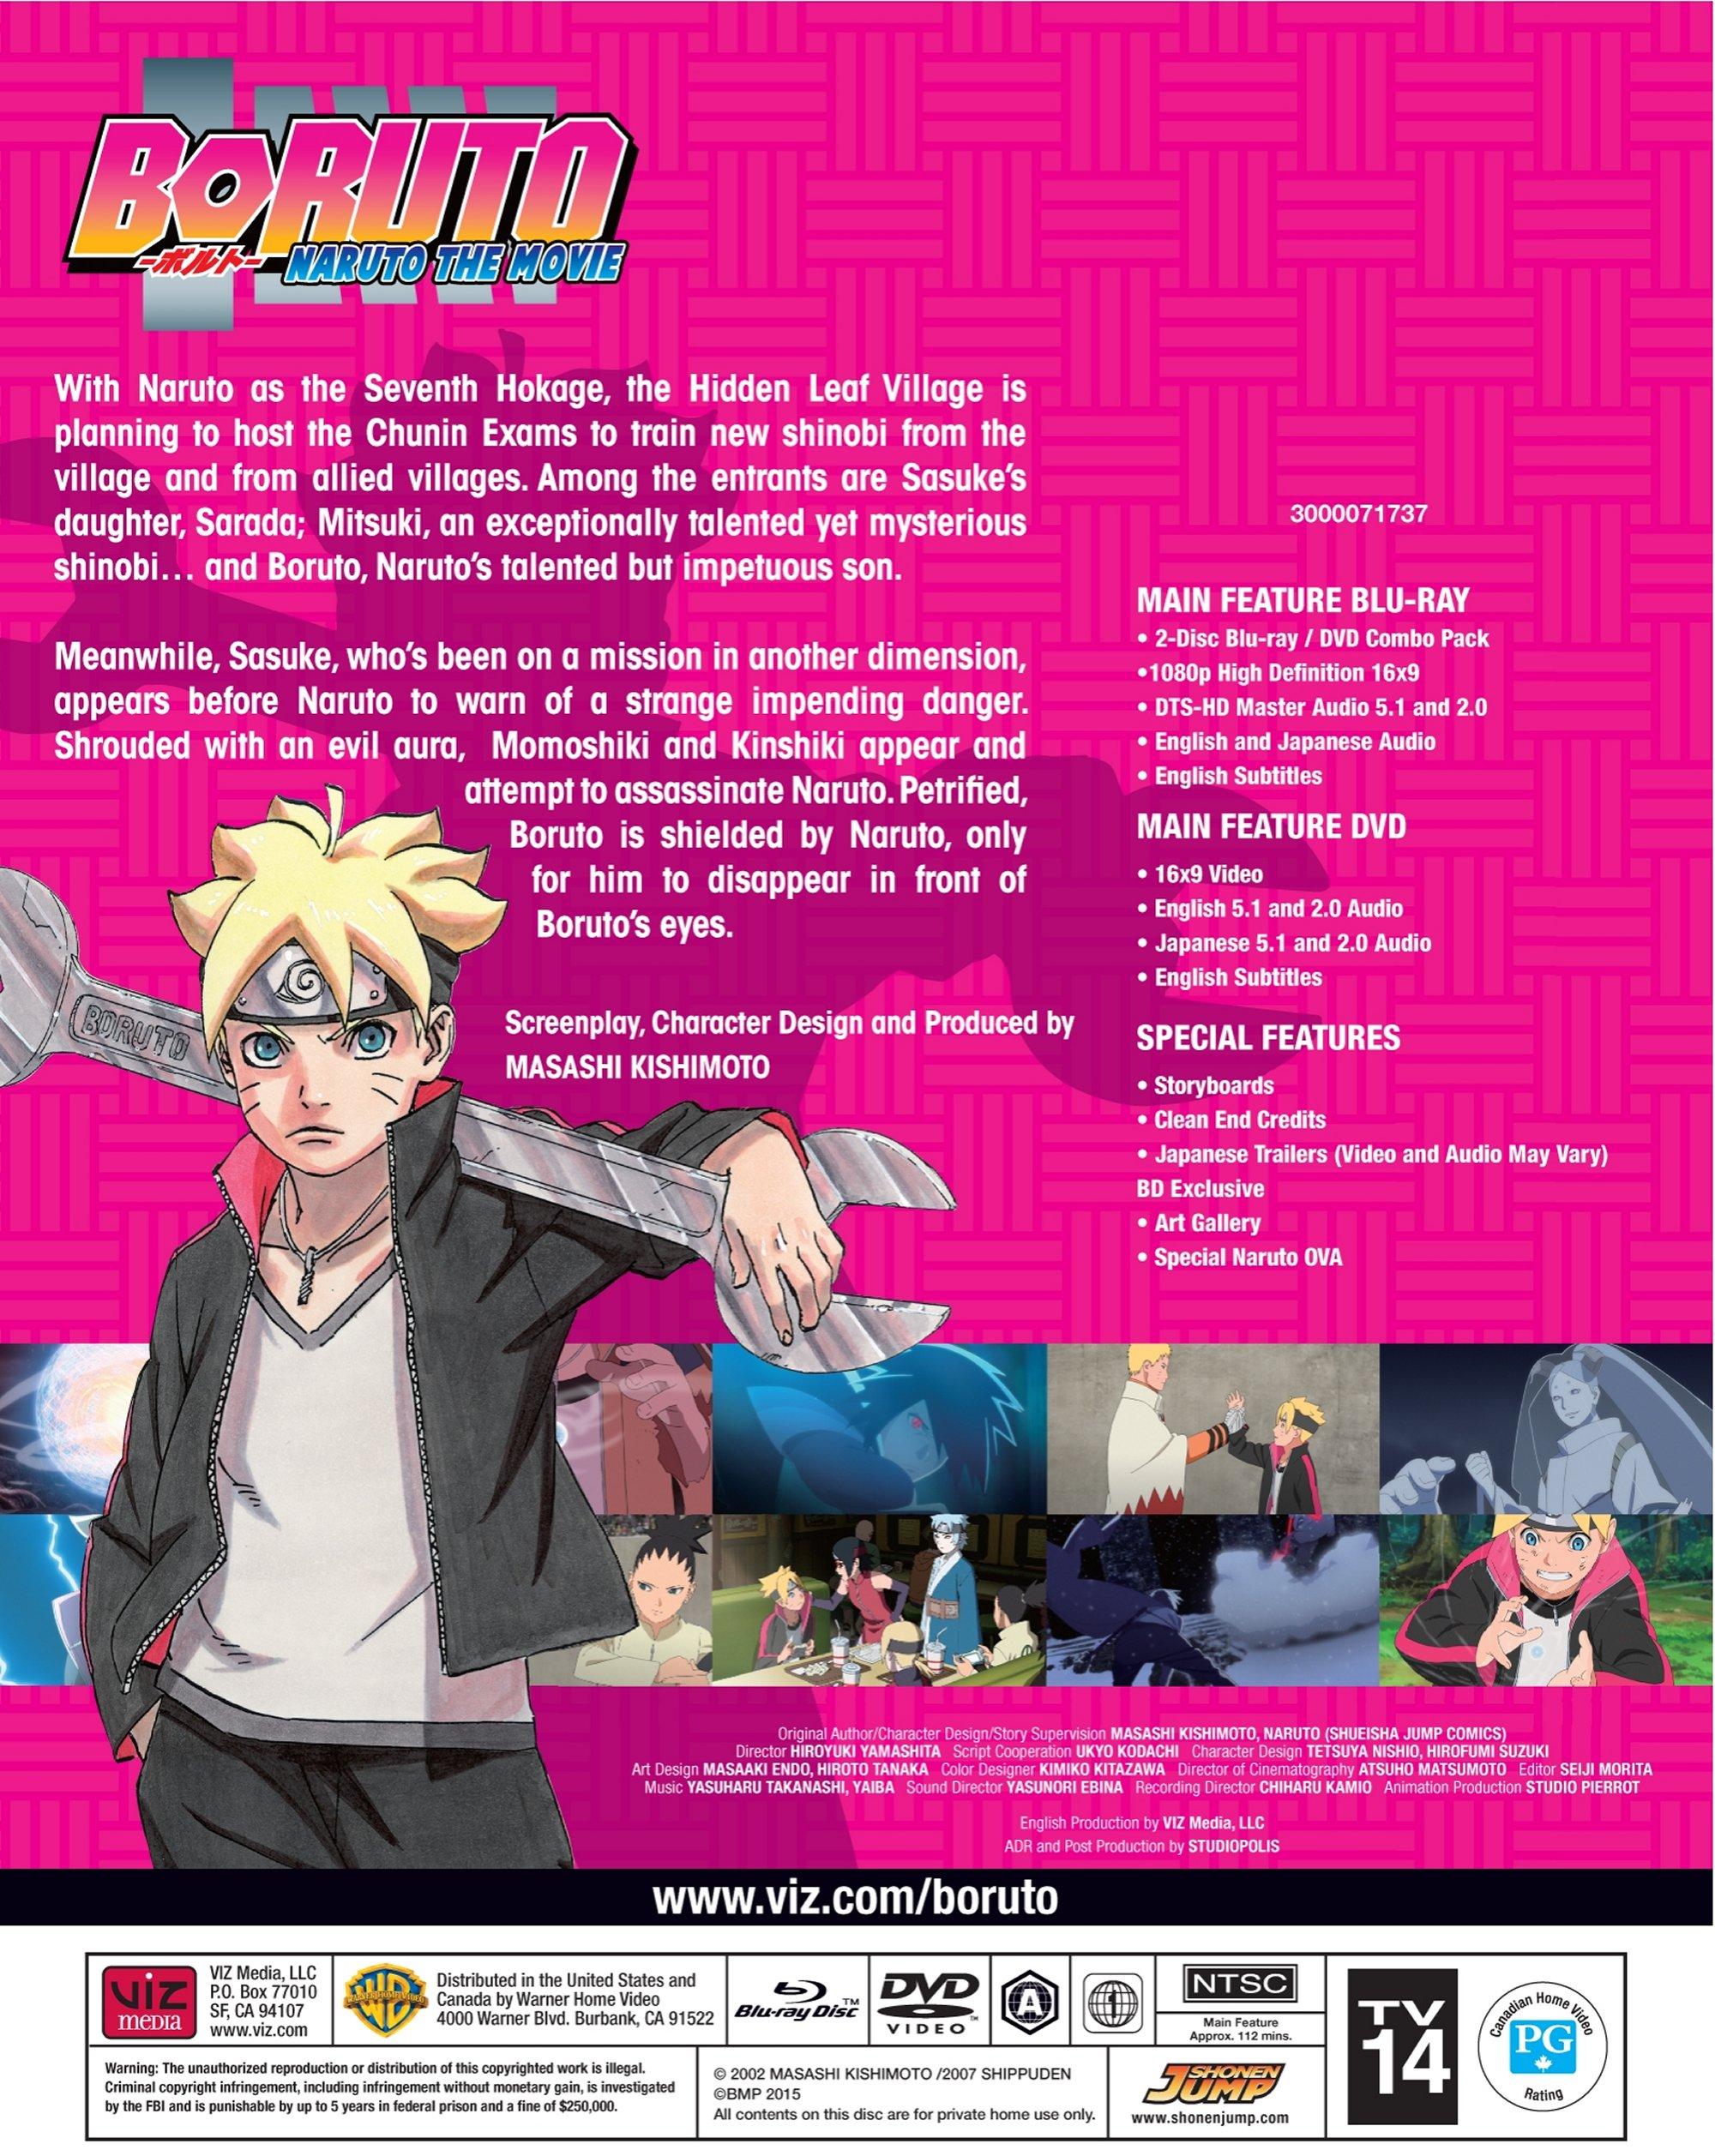 boruto naruto the movie blu ray dvd